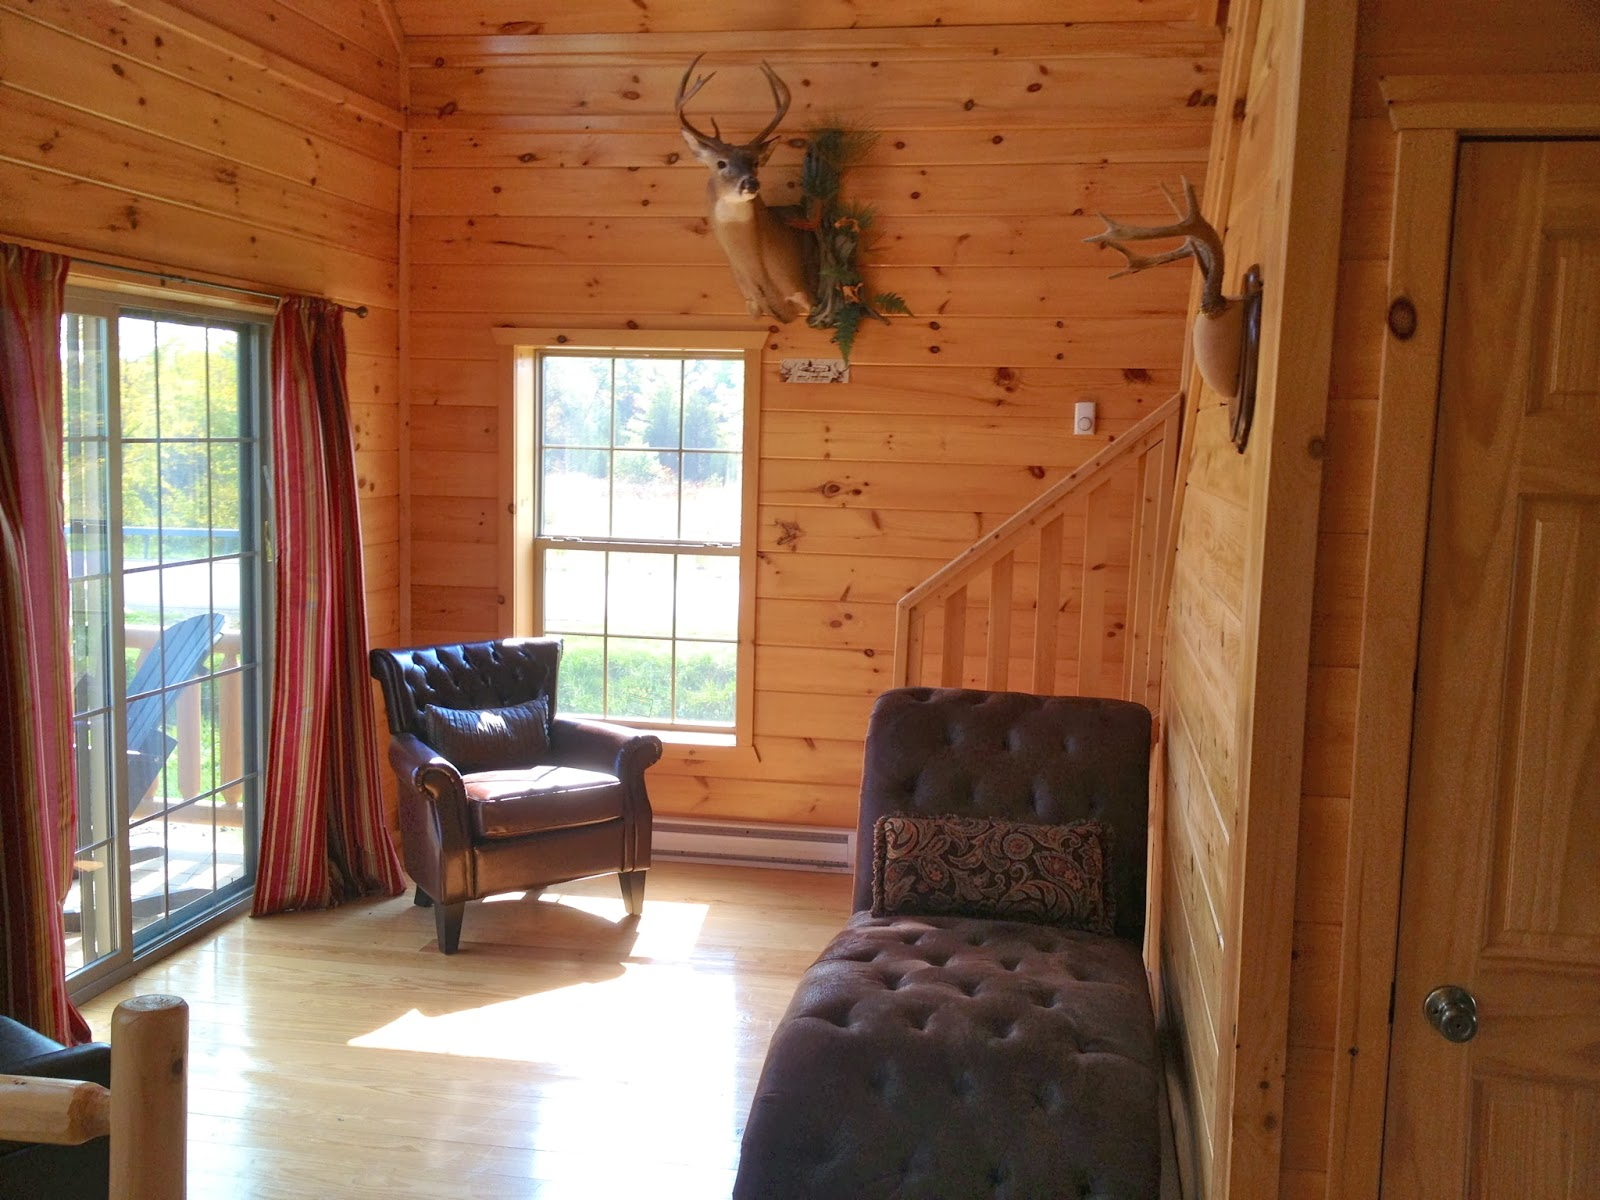 Small Scale Homes: Wood-Tex Prefab Cayuga Log Cabin